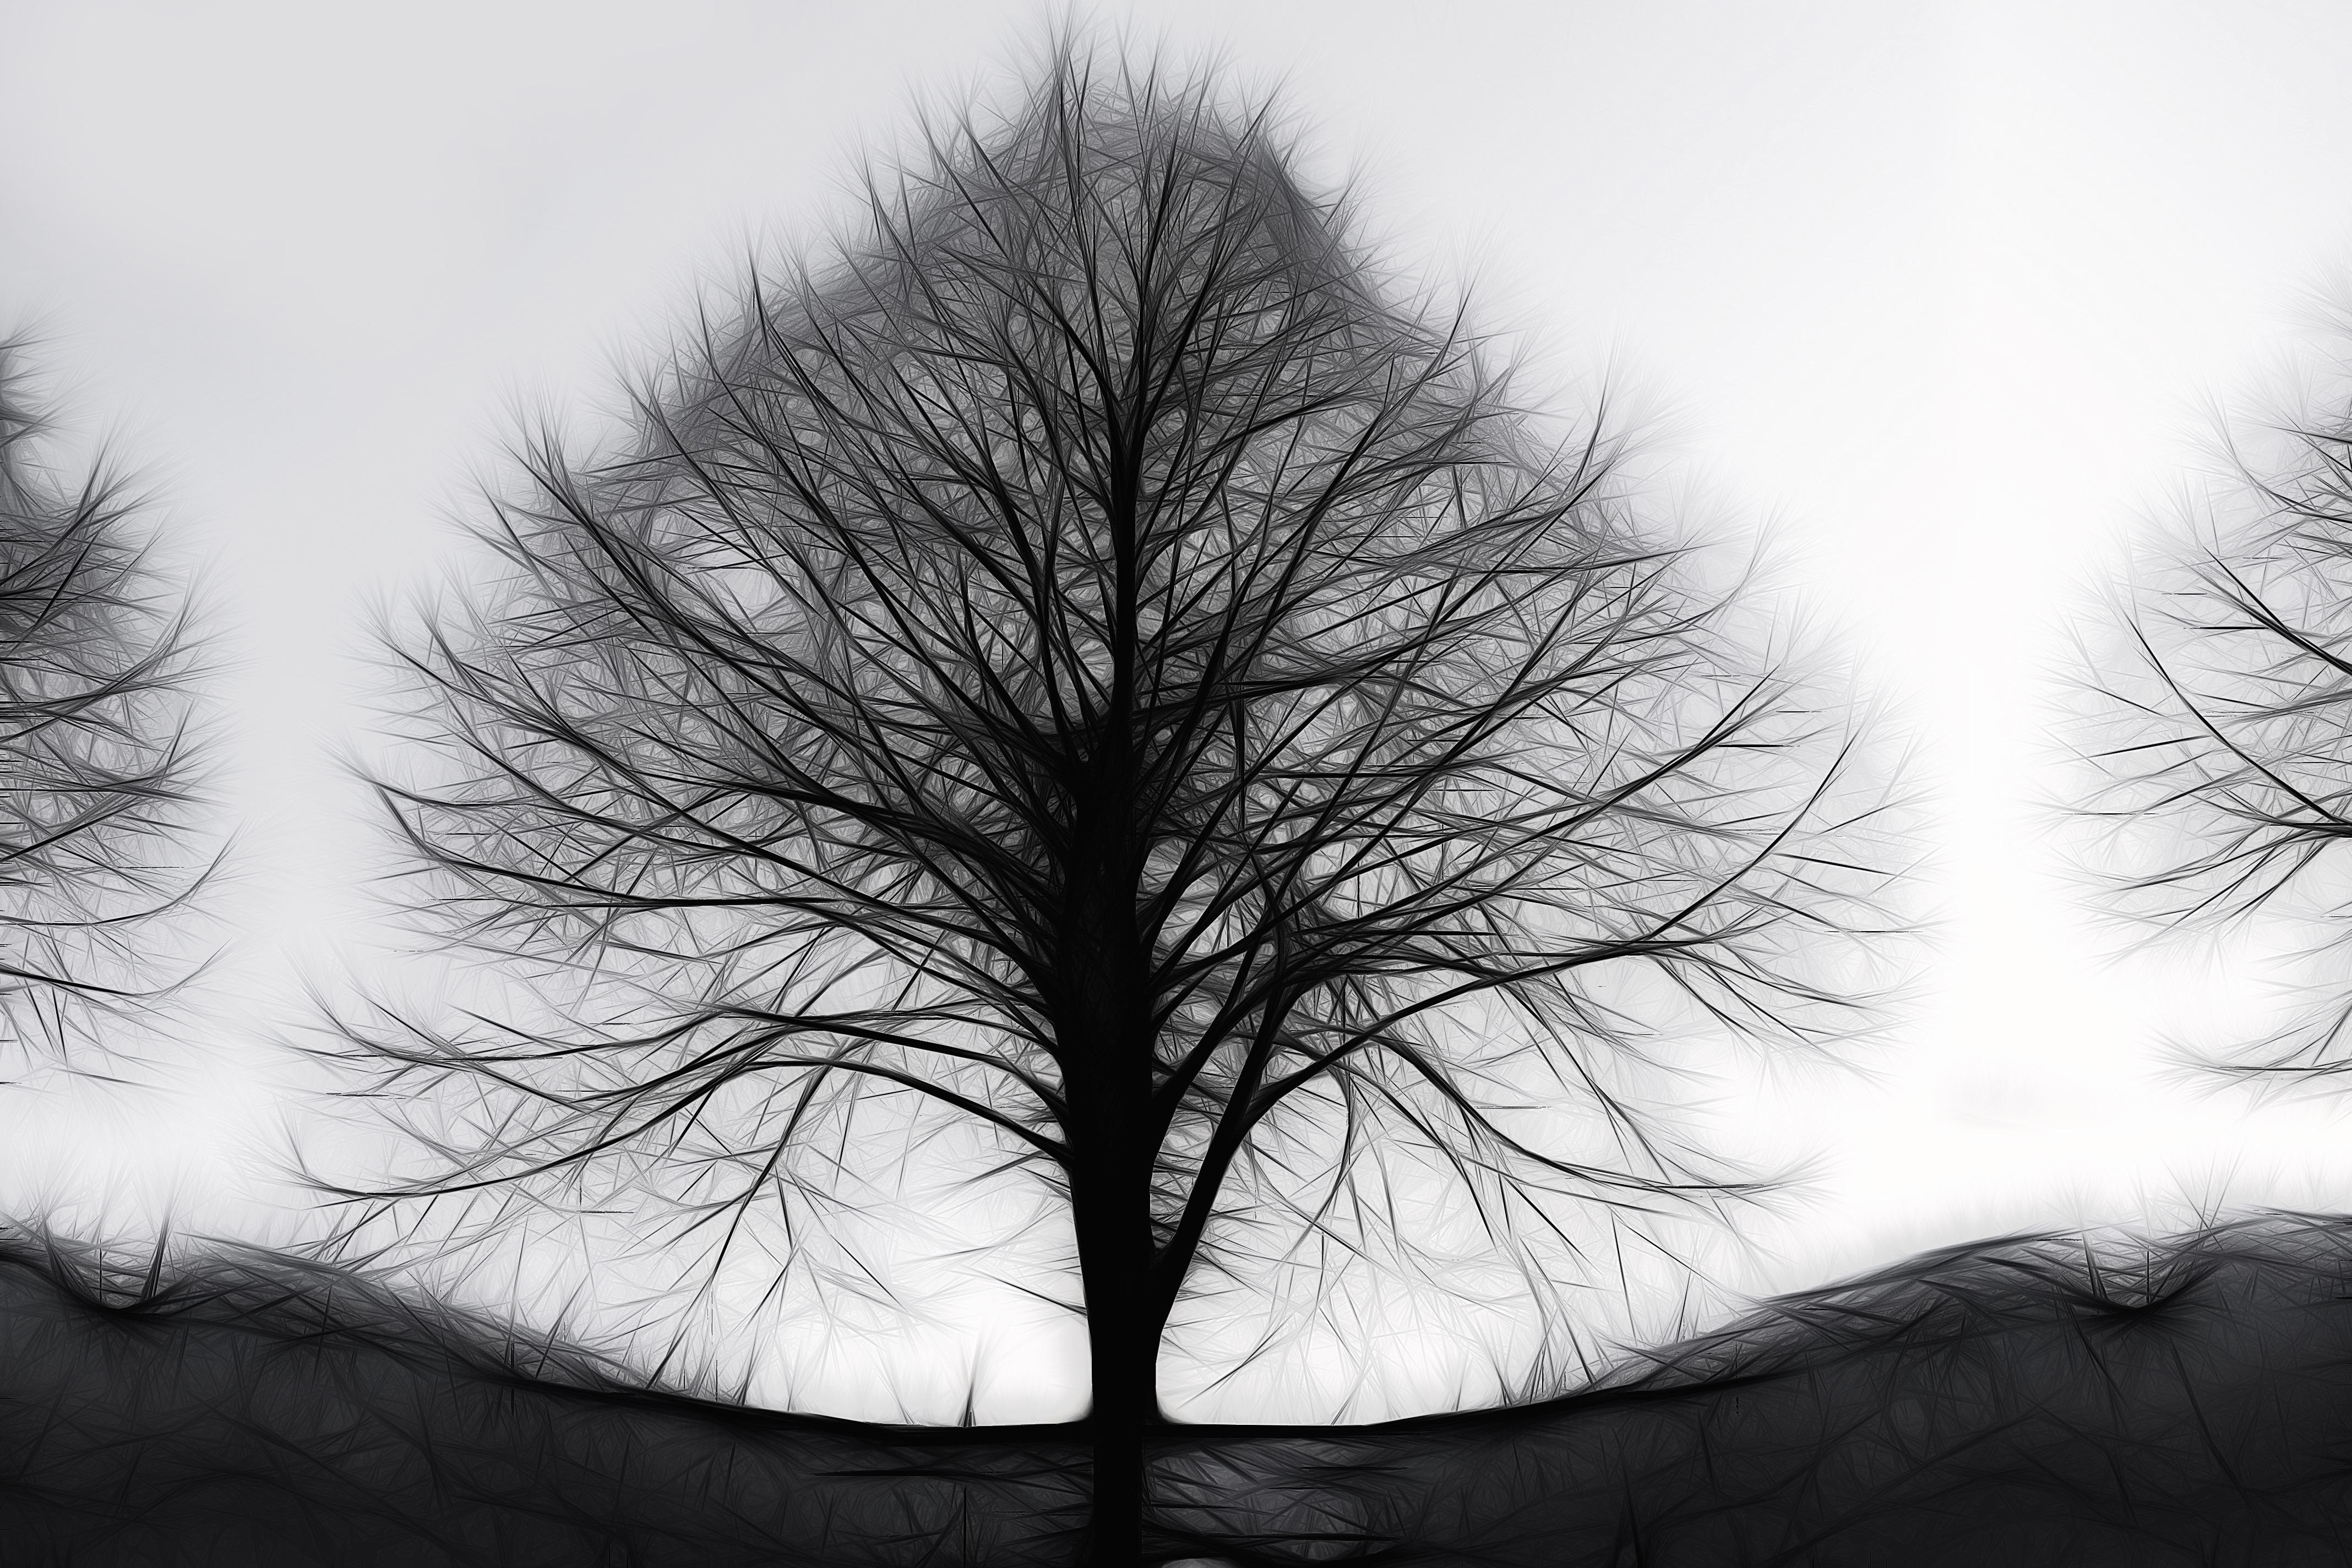 Abstract fractal tree  Photopublicdomaincom